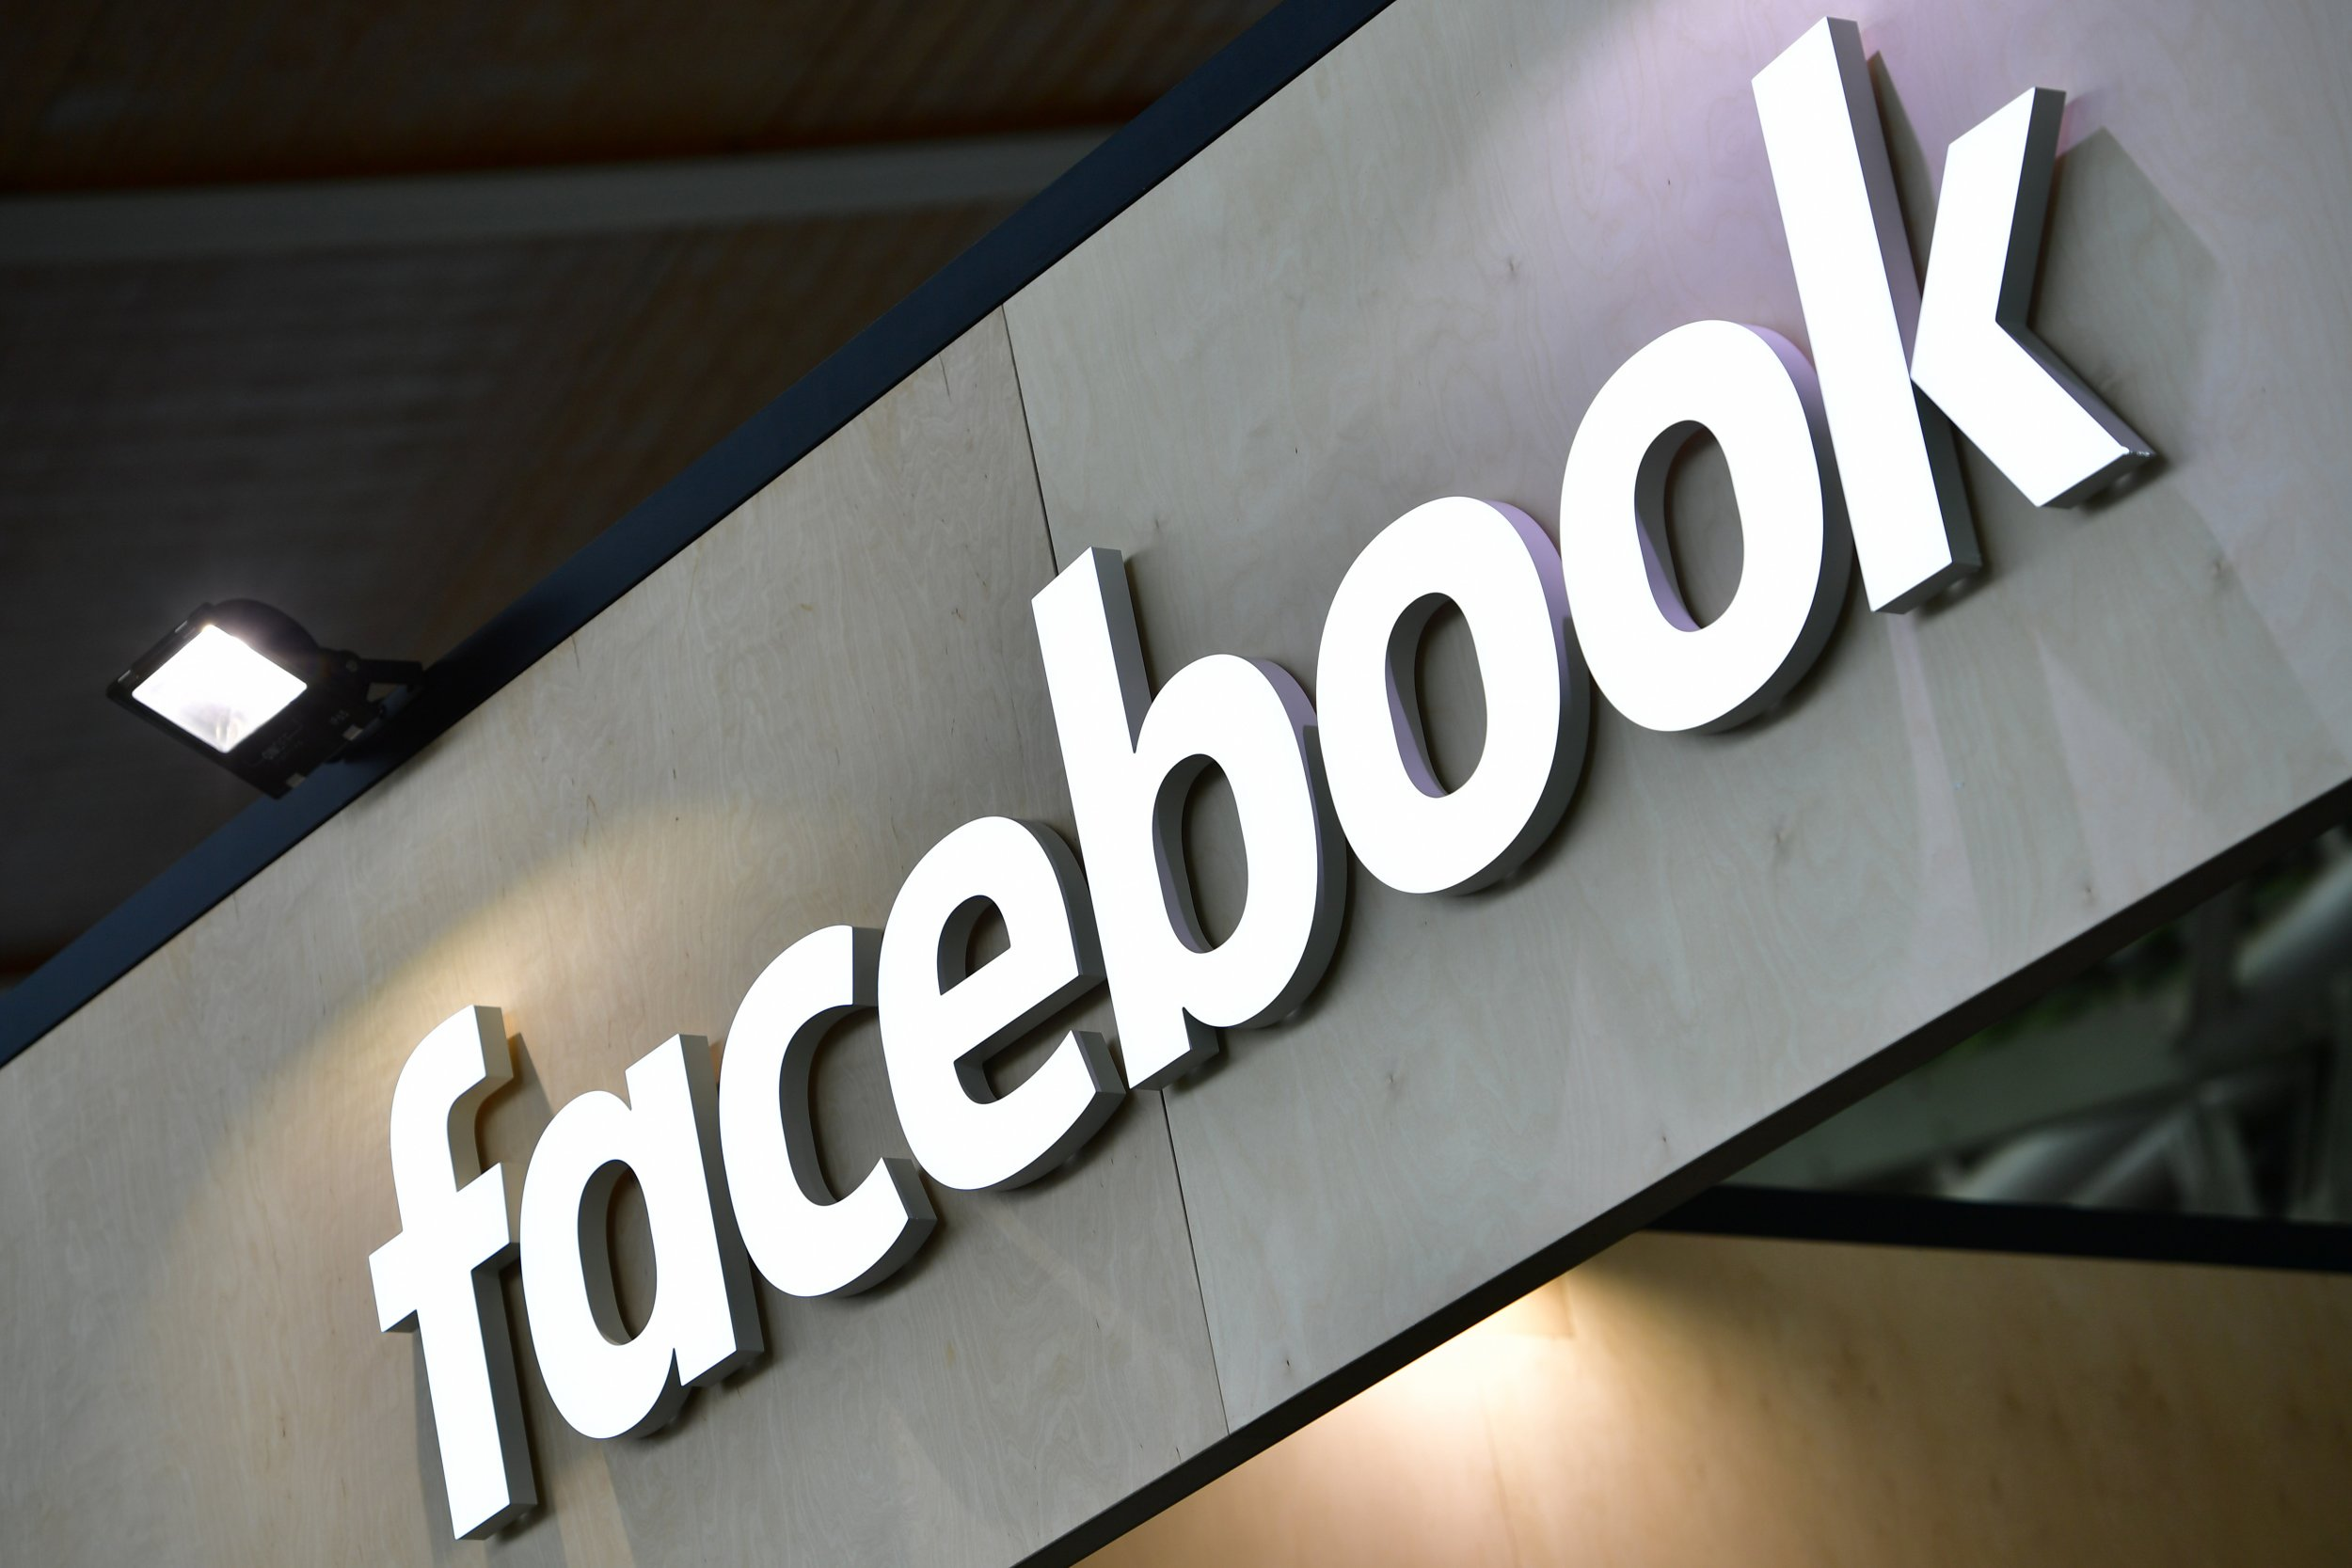 Fake News, Facebook, Twitter, Social Media, 2016 Election, Donald Trump